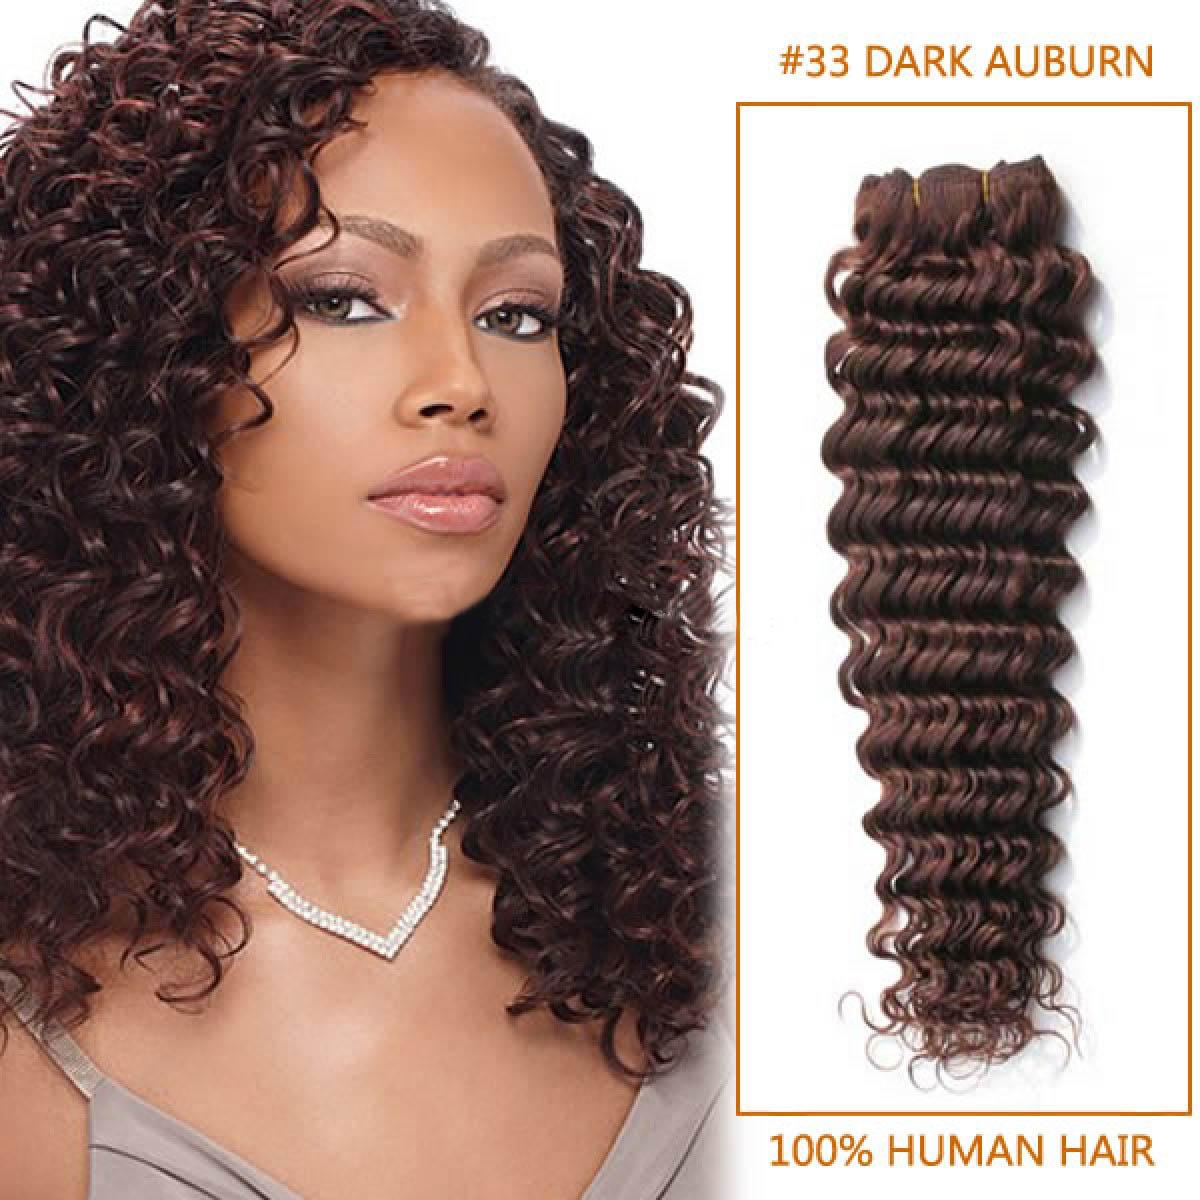 inch #33 dark auburn deep wave indian remy hair wefts